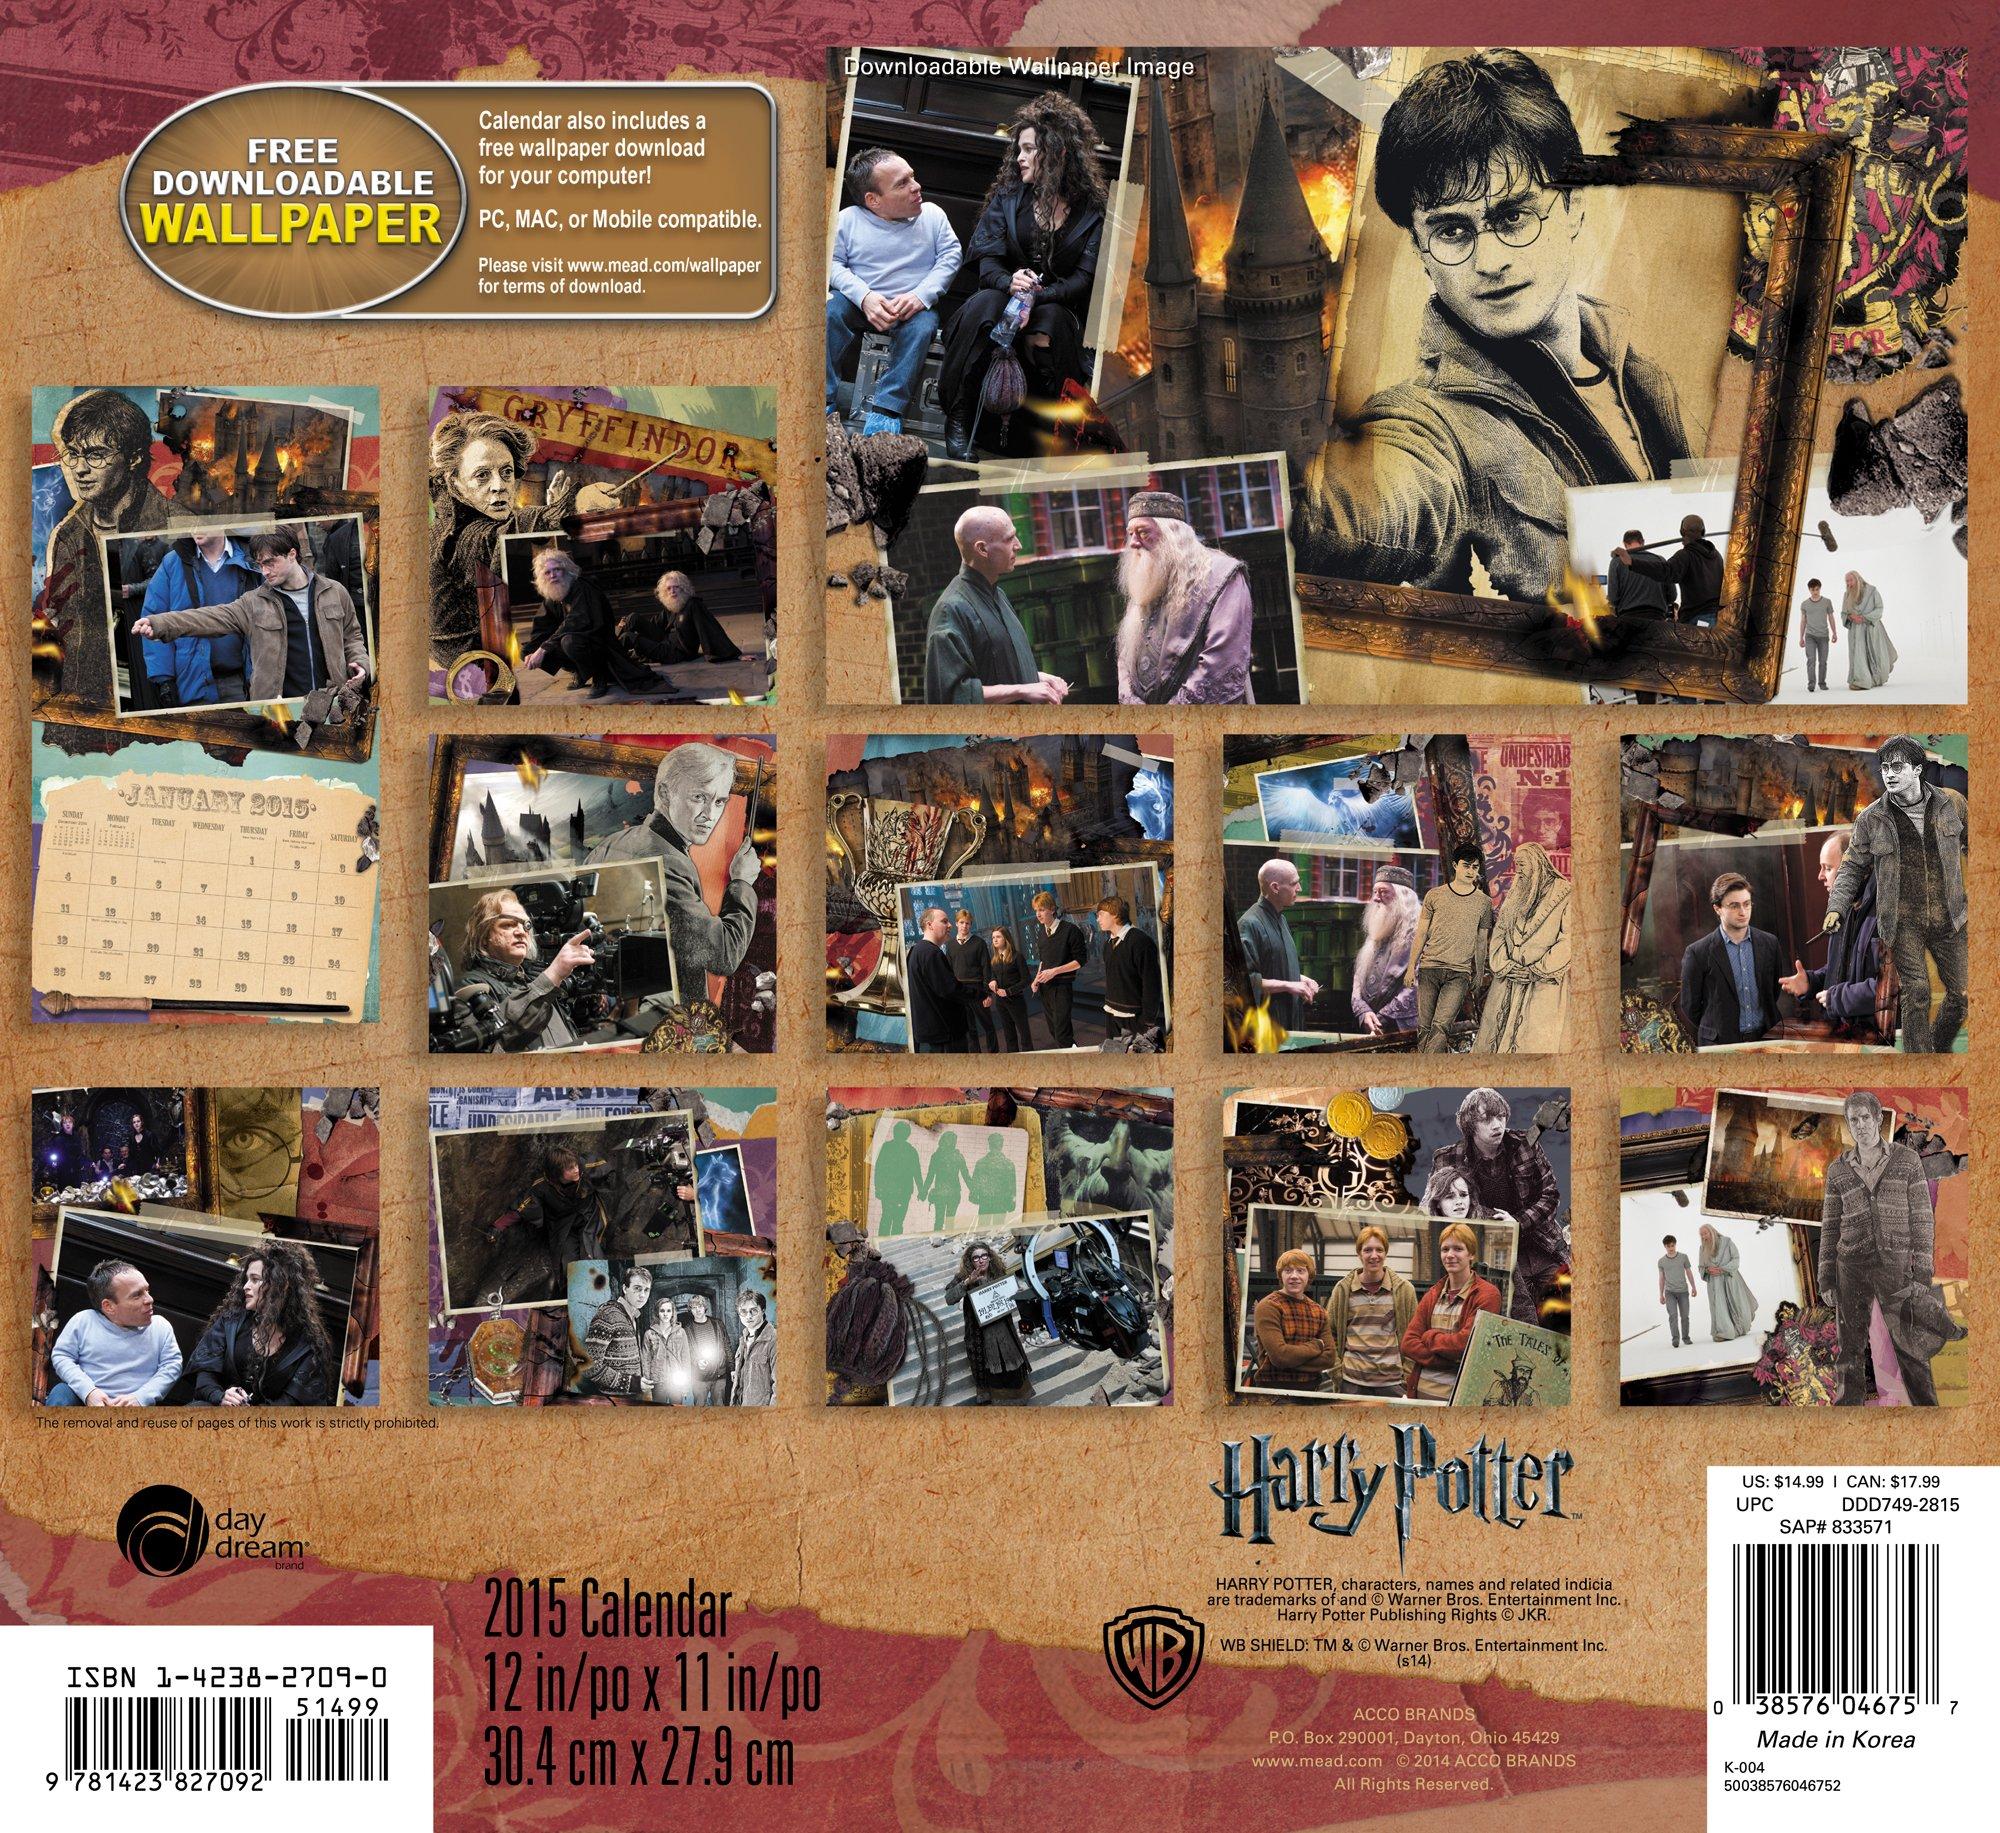 Top Wallpaper Harry Potter Square - A192lqRgNpL  Collection_5925100.jpg